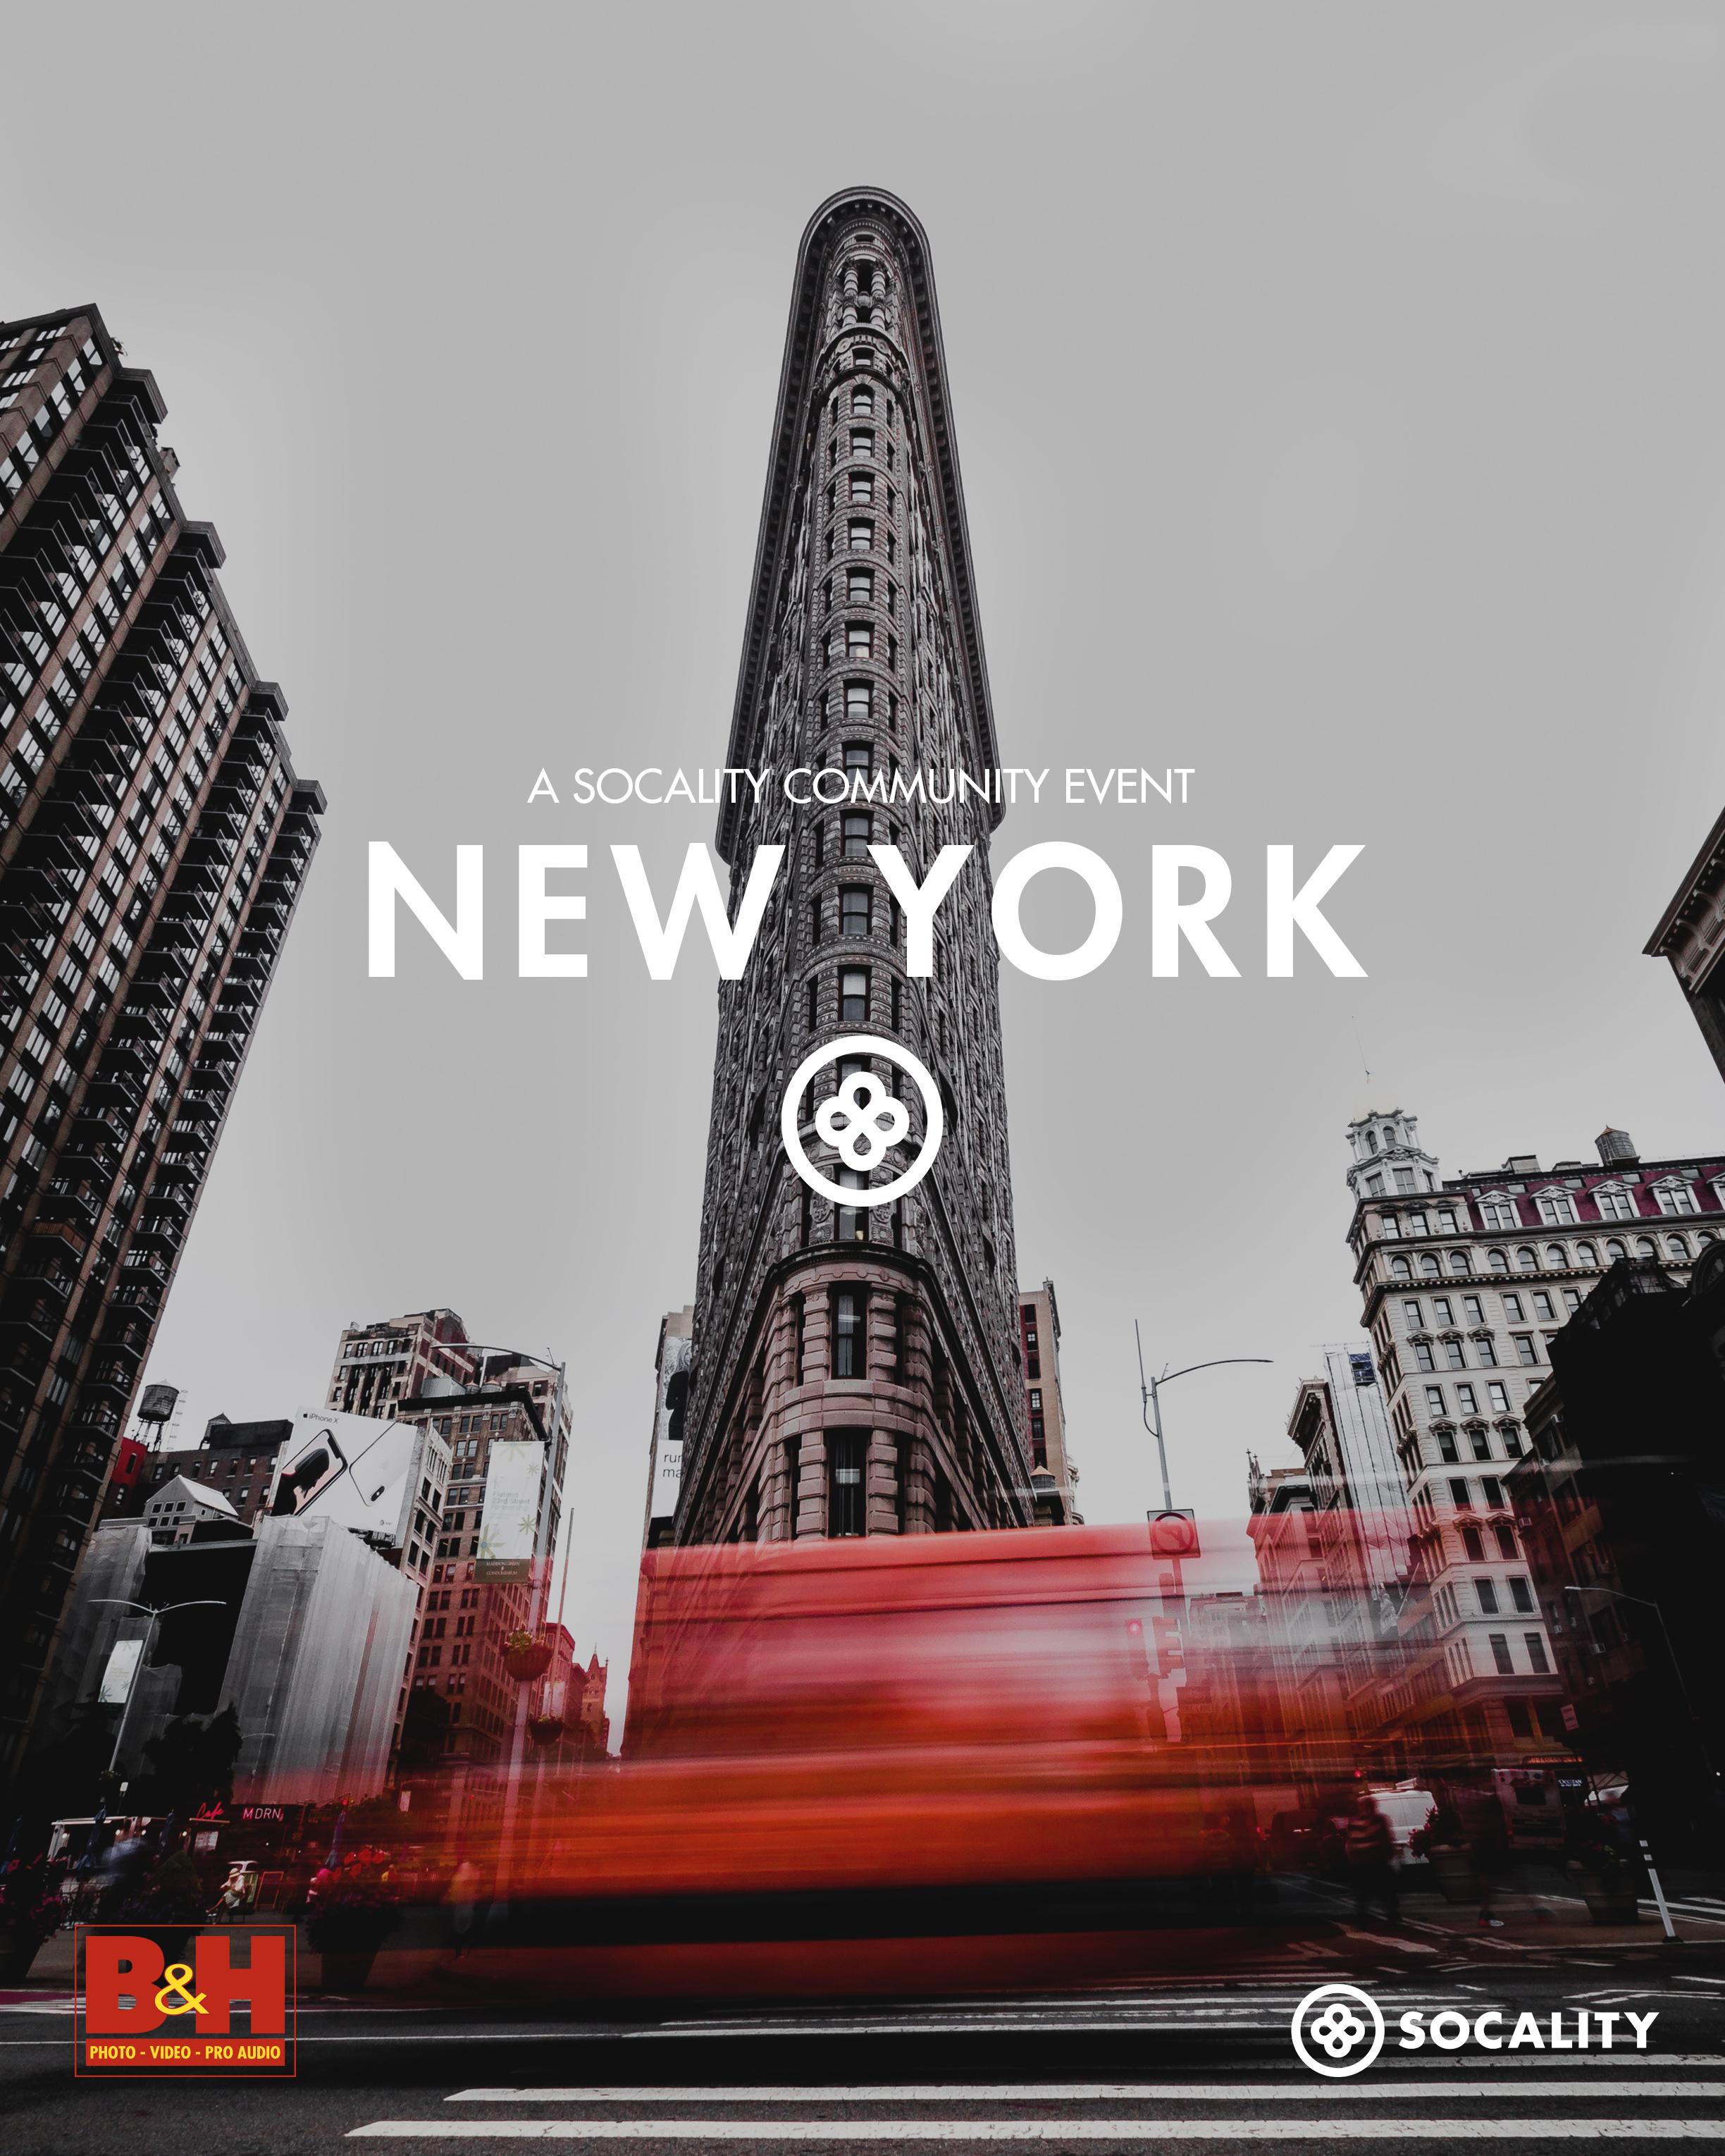 NYC_4x5_Eventbrite.jpg